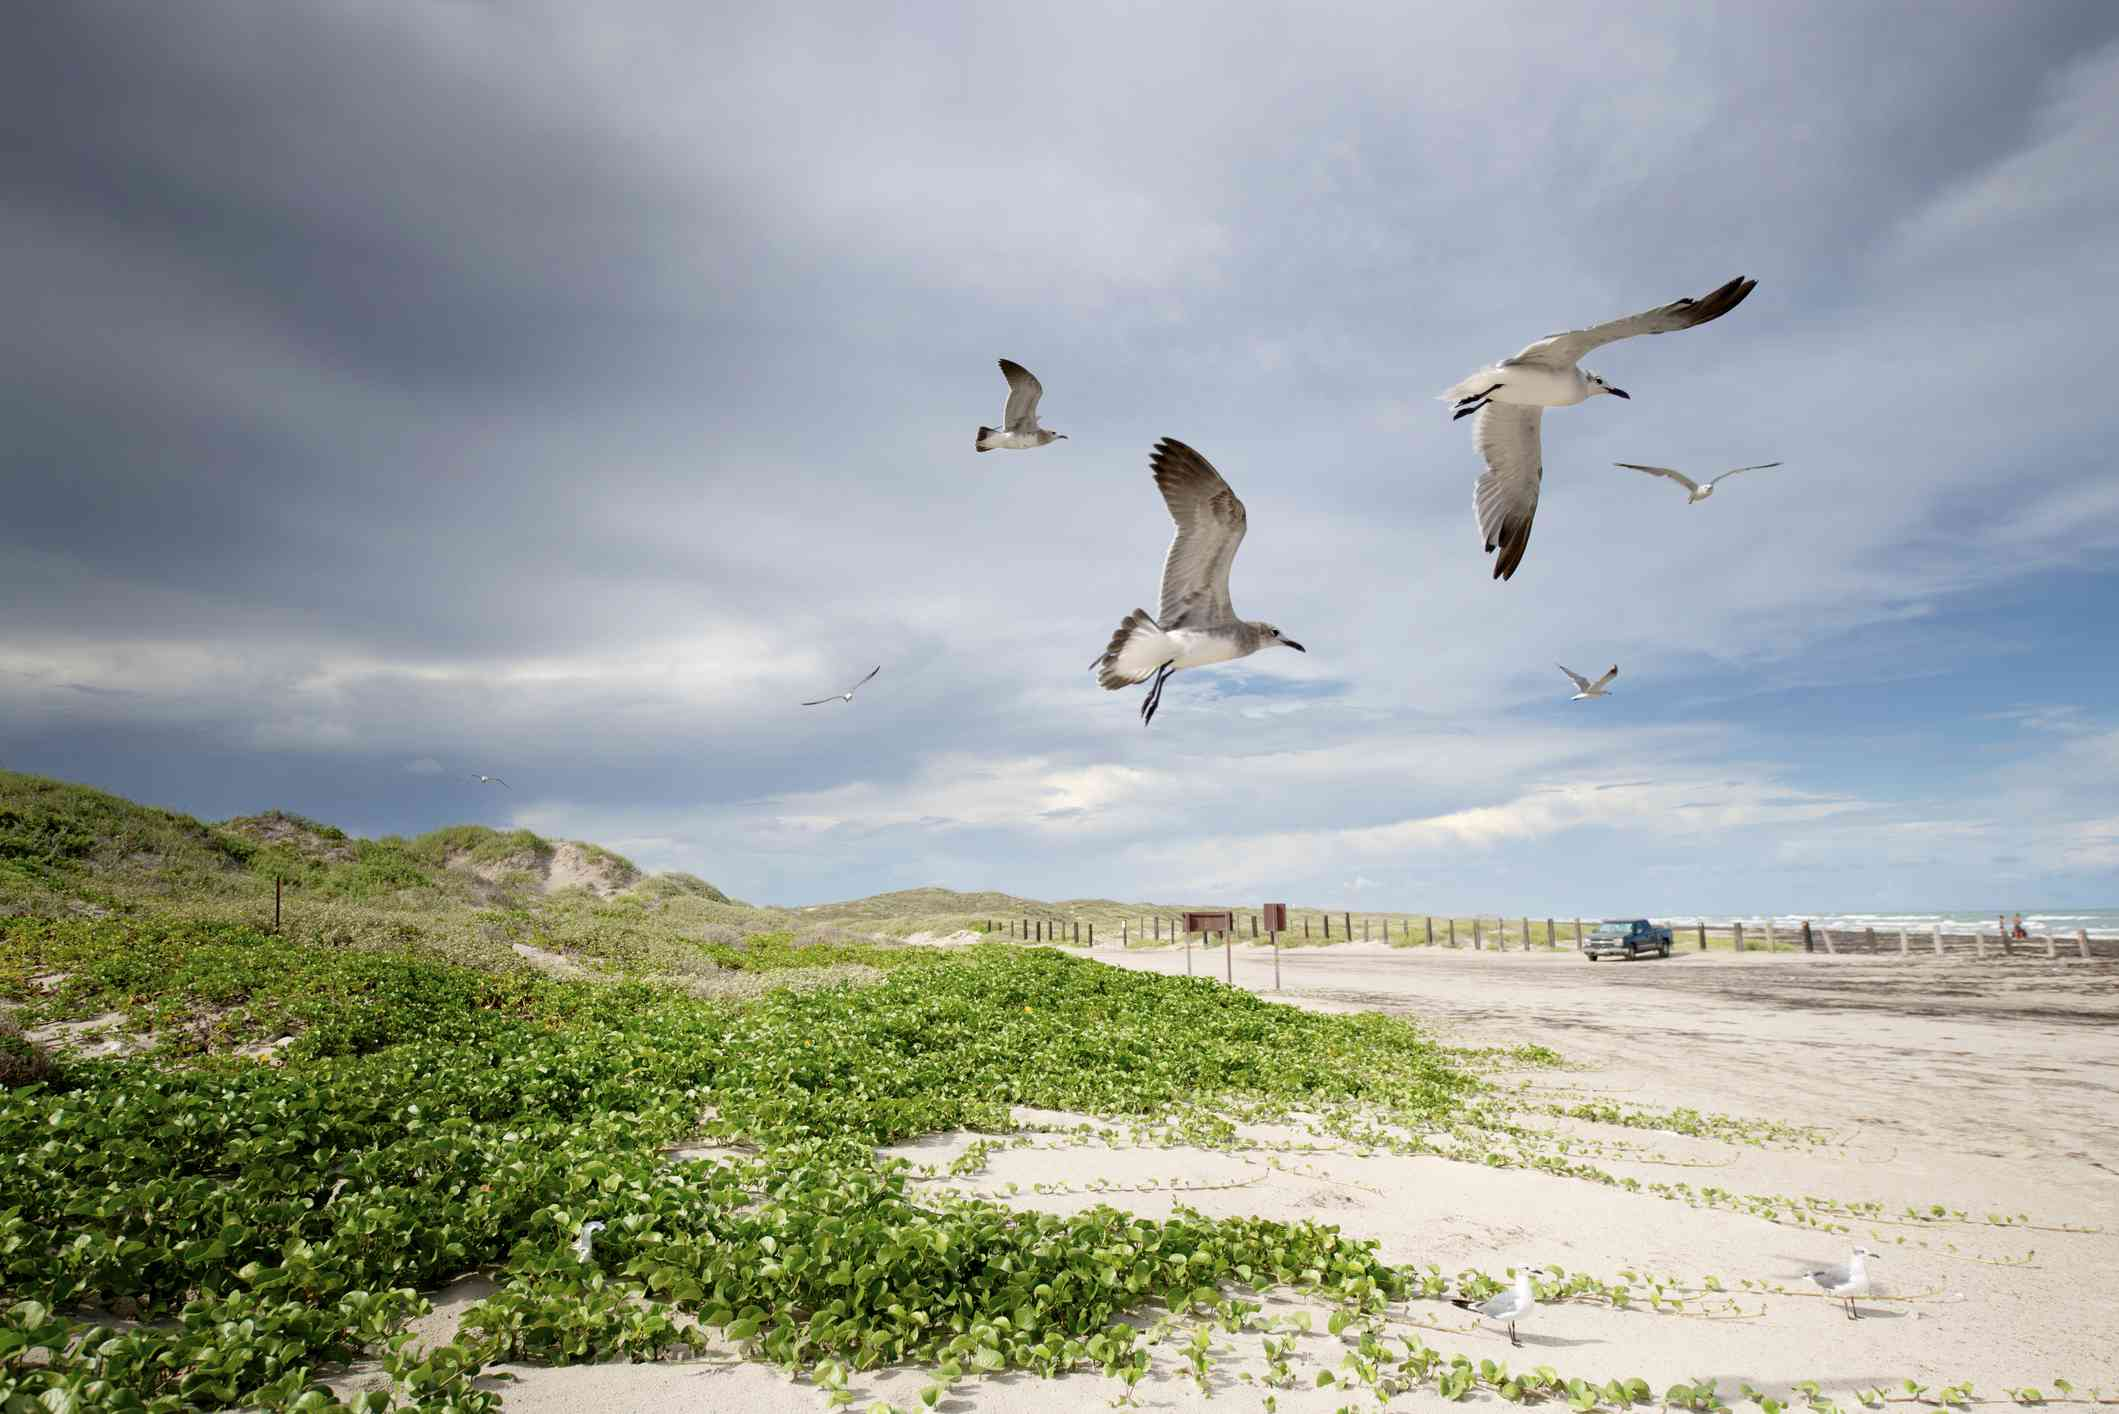 Seagulls in flight at North Padre Island, Texas.